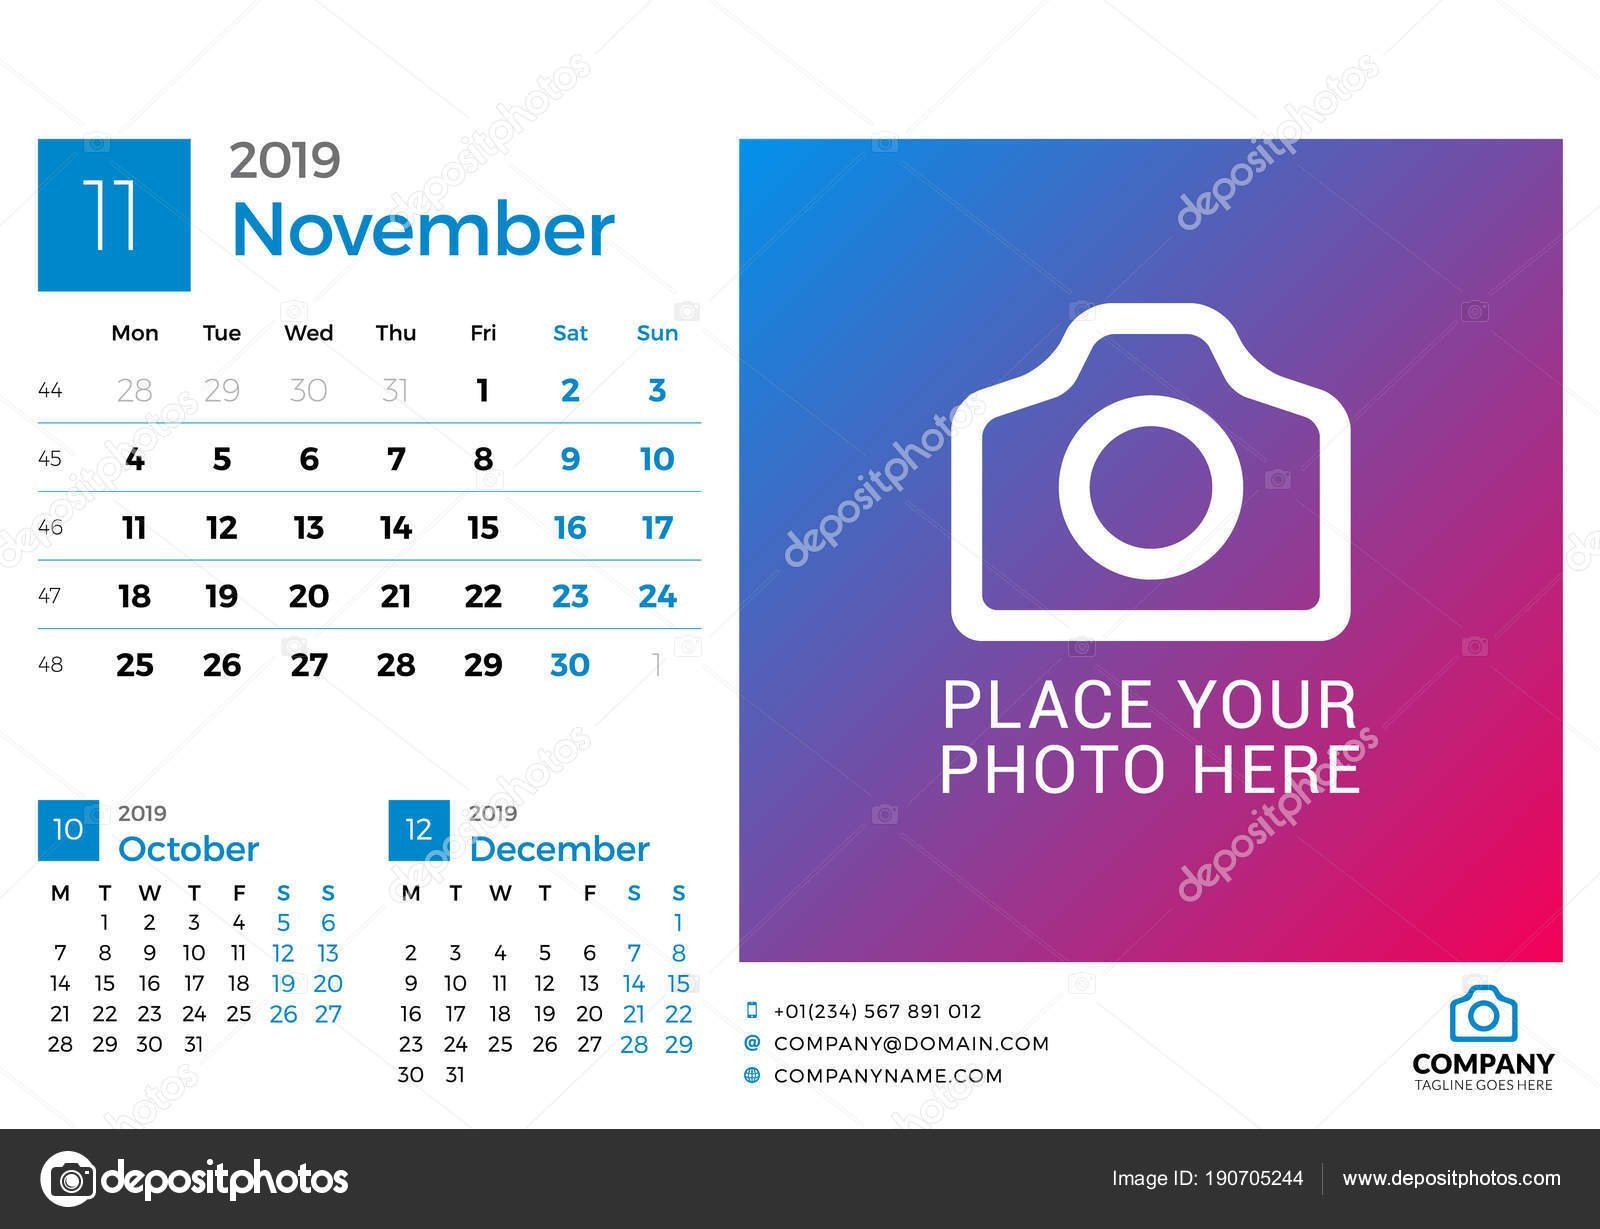 Calendar For November 2019. Vector Design Print Template With Place Calendar Week 46 2019